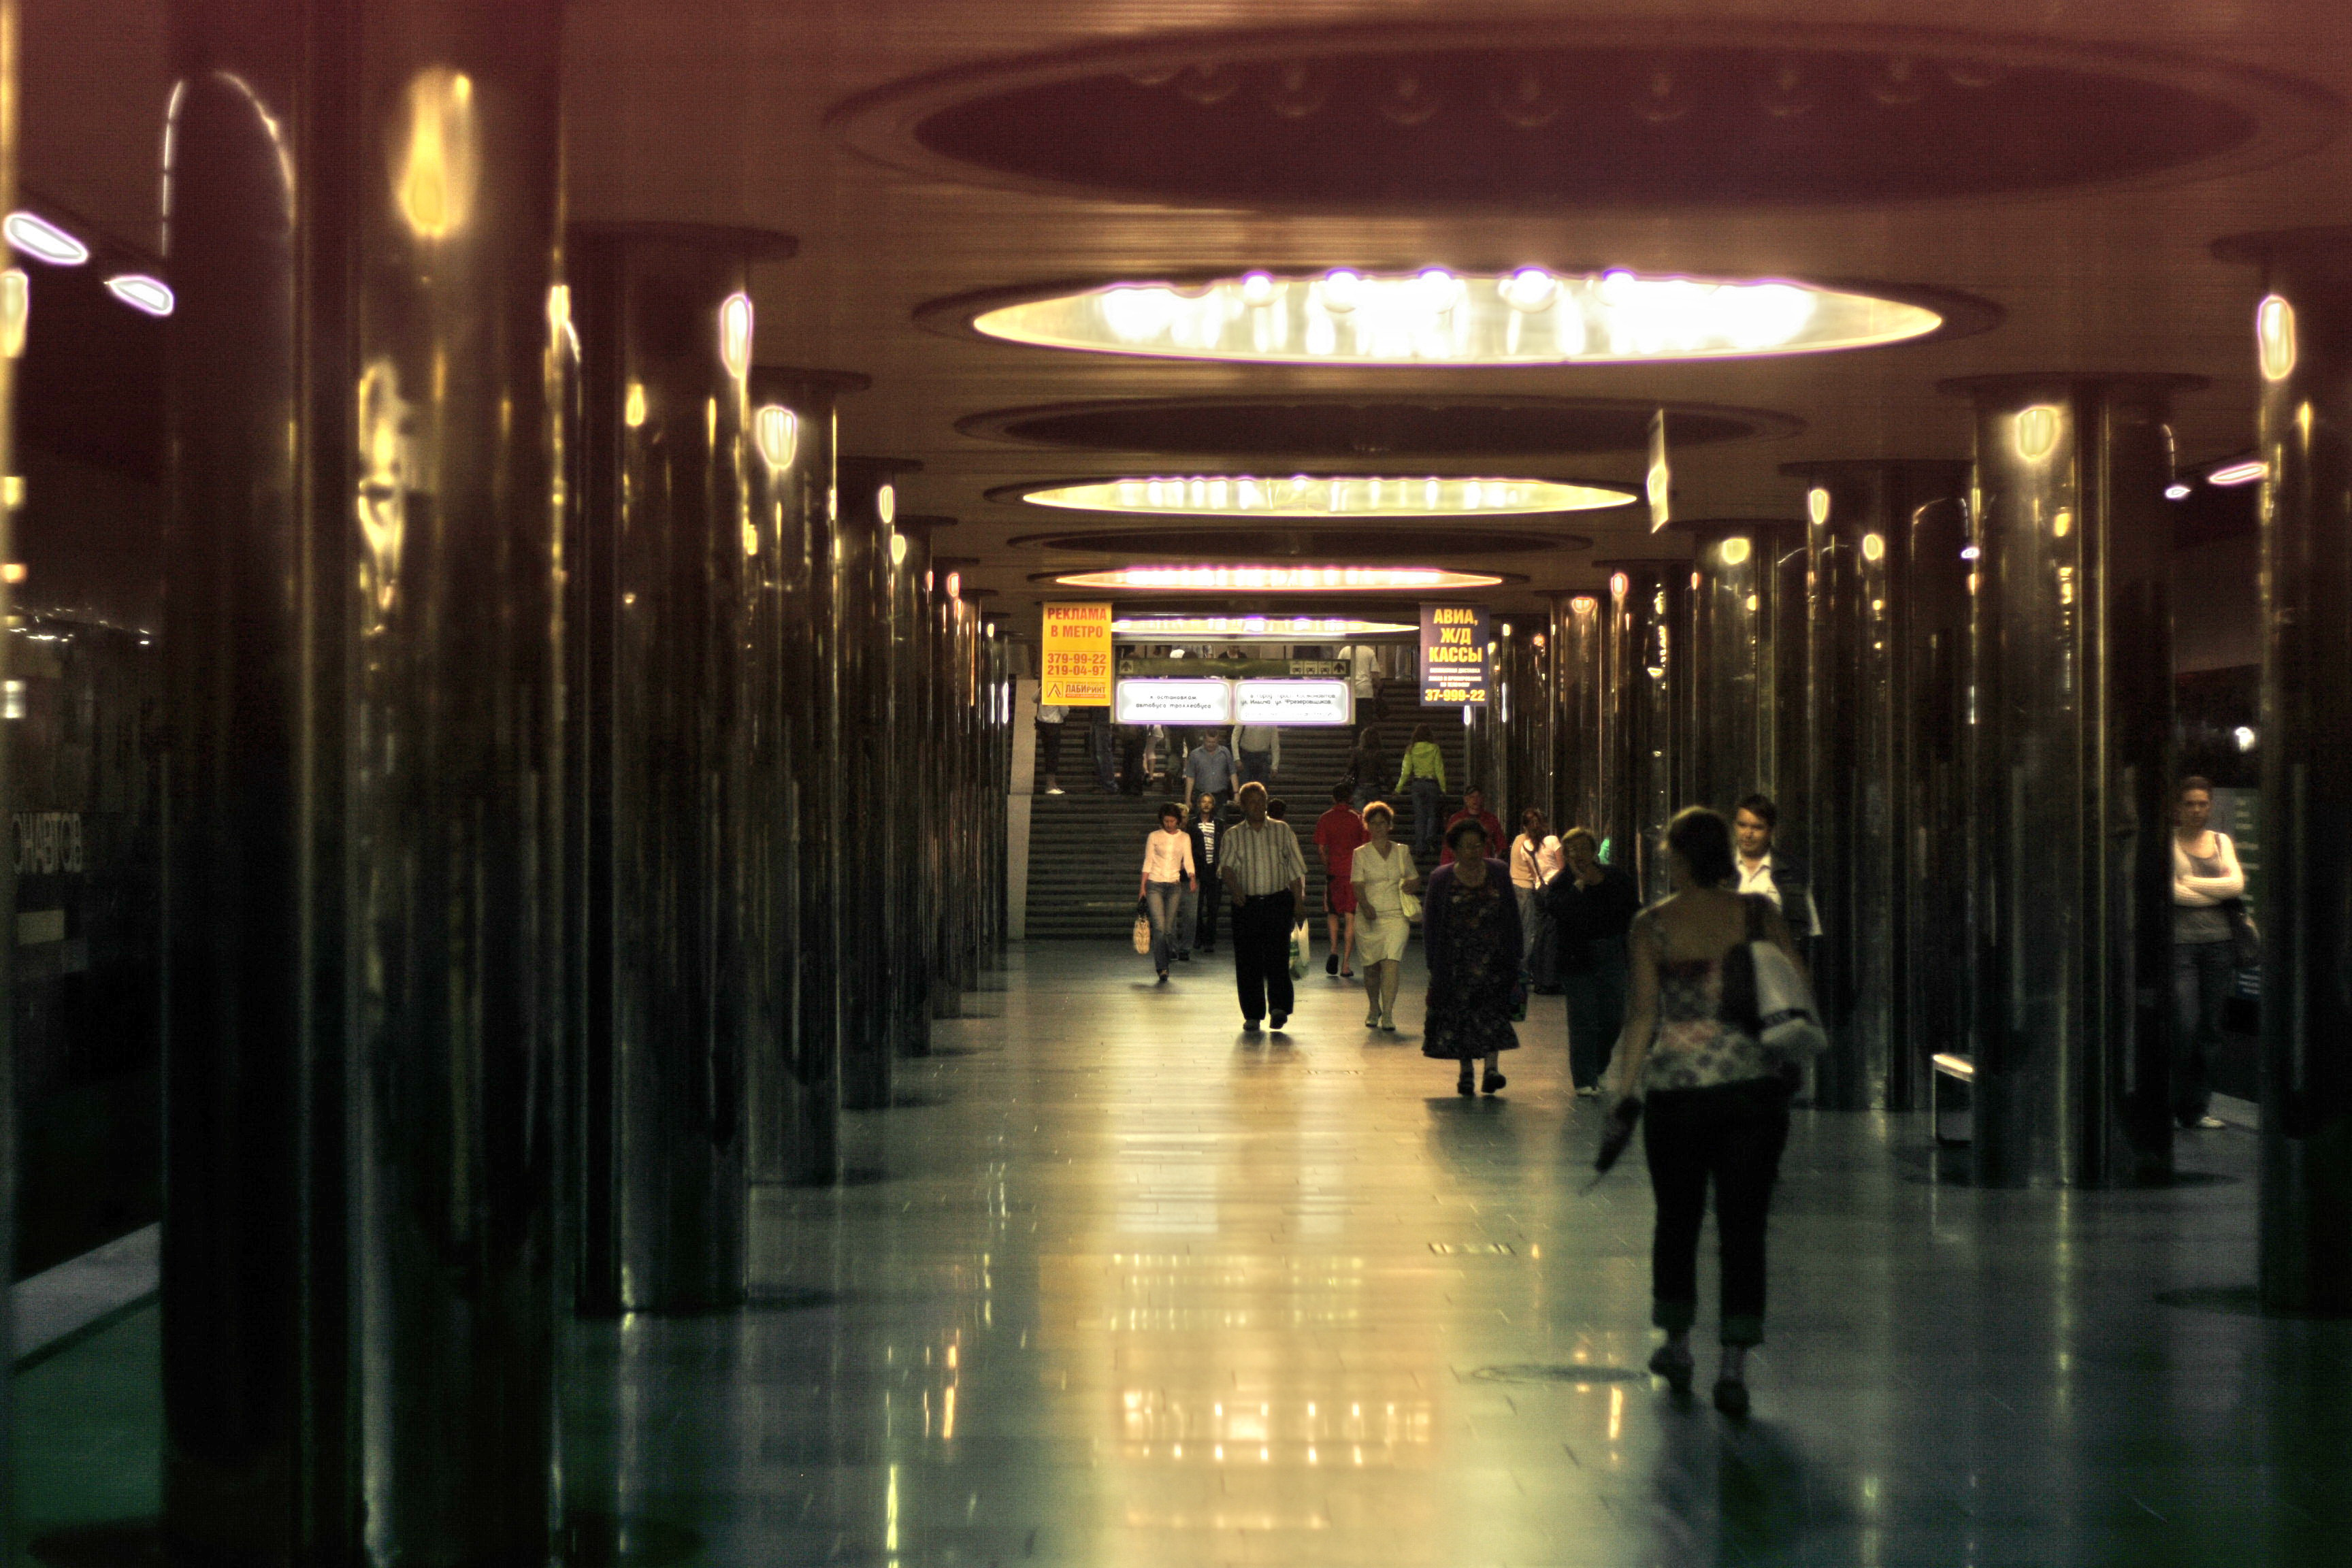 prospekt kosmonavtov yekaterinburg metro wikiwand. Black Bedroom Furniture Sets. Home Design Ideas